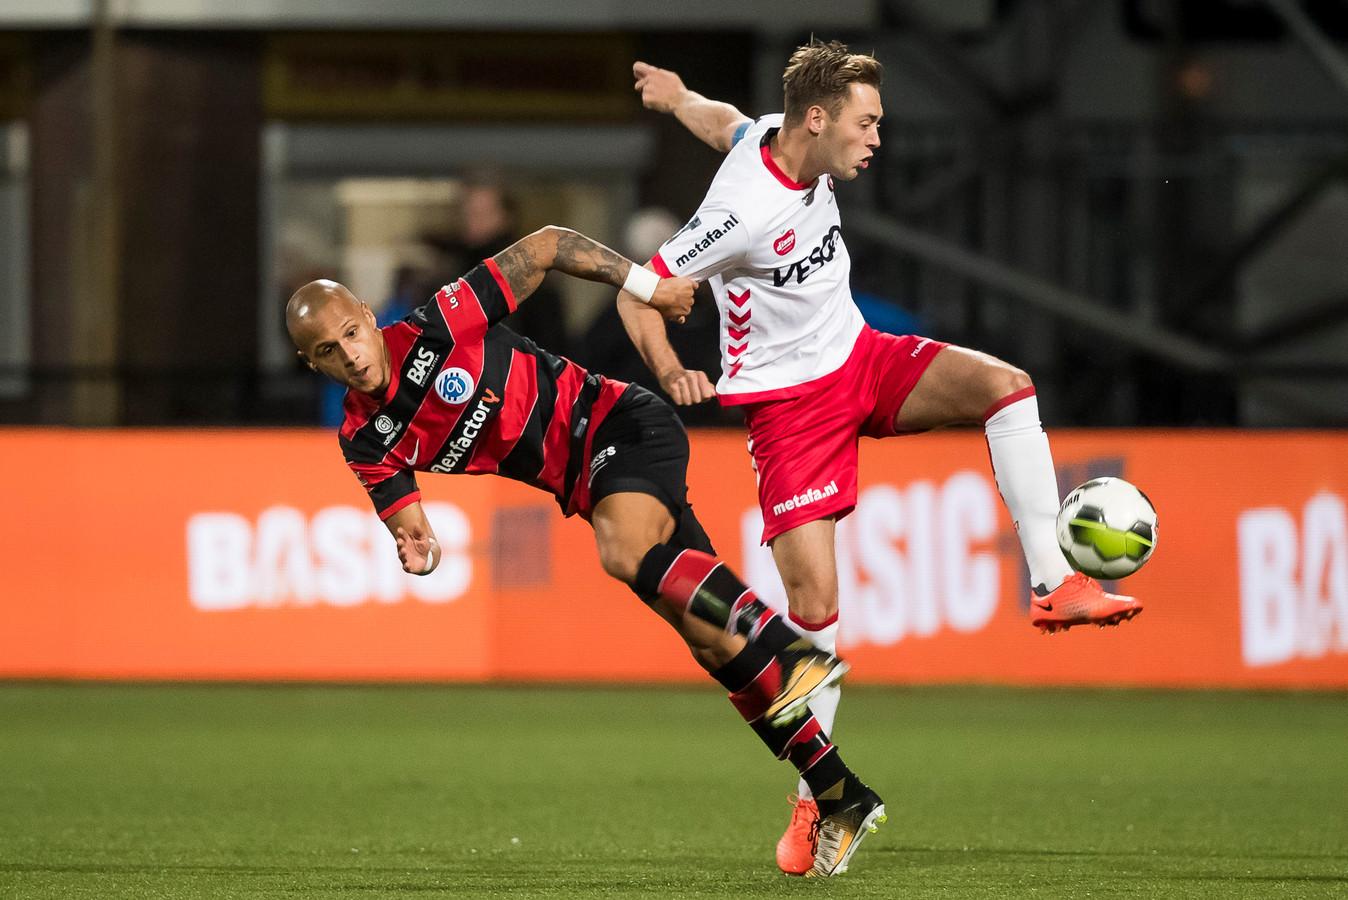 Helmond Sport Na Acht Duels Nog Altijd Zonder Zege Foto Ednl